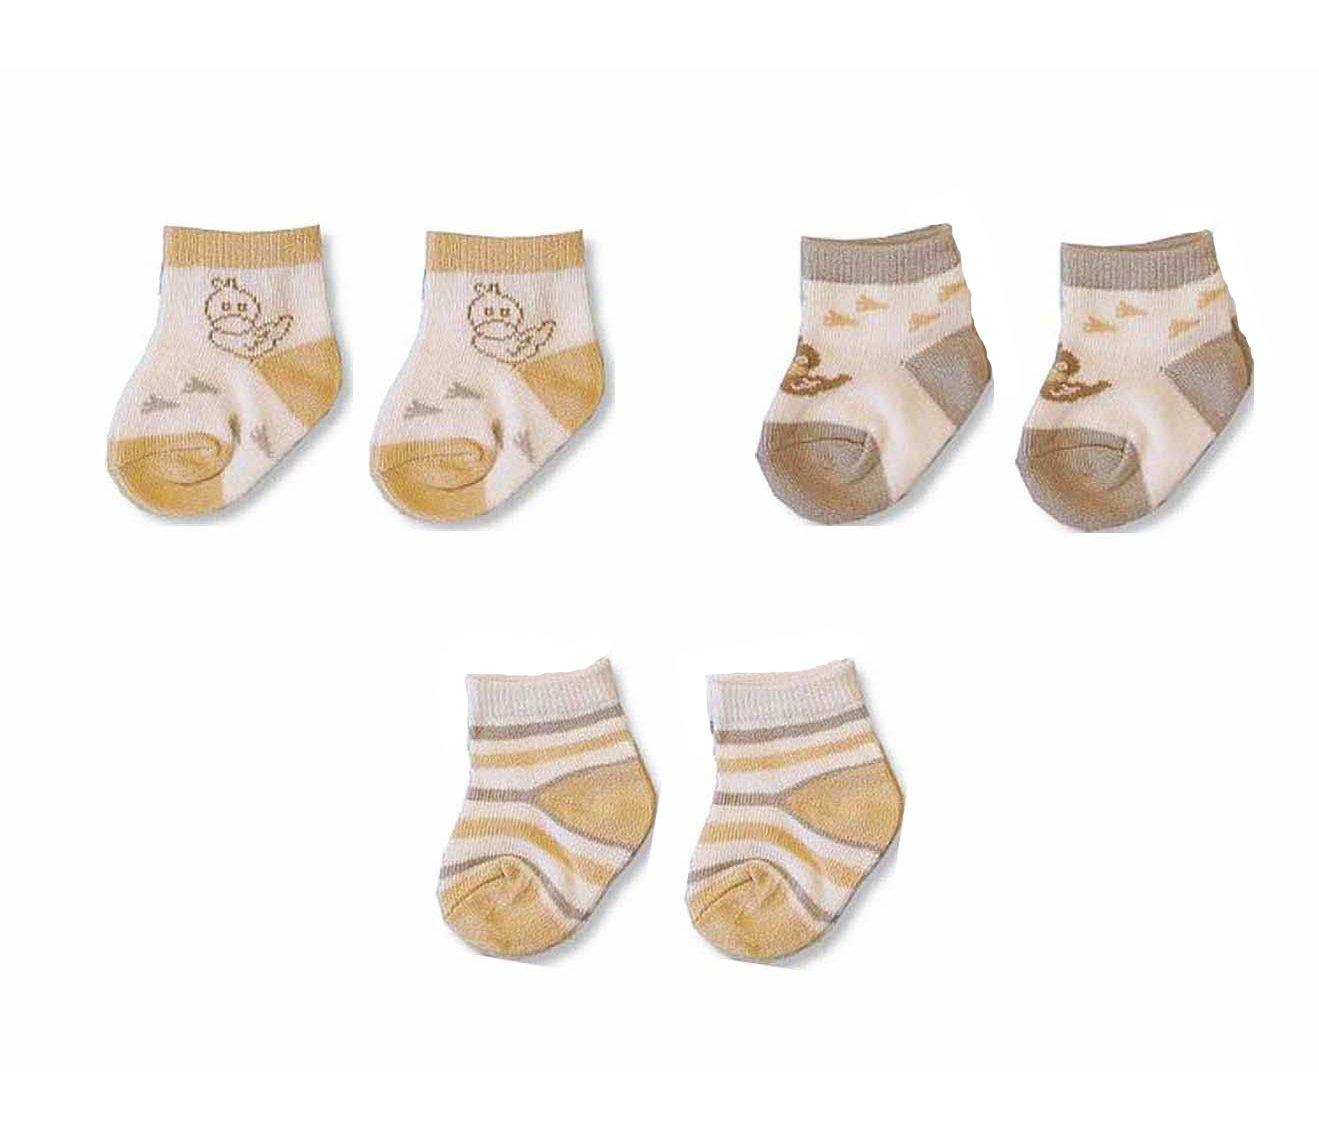 Baby Boys/Girls Cute Socks 3 Pairs - Cream Quack Design (UK 0-2 / EUR 16-18) Nursery Time BW 6112-2103 105